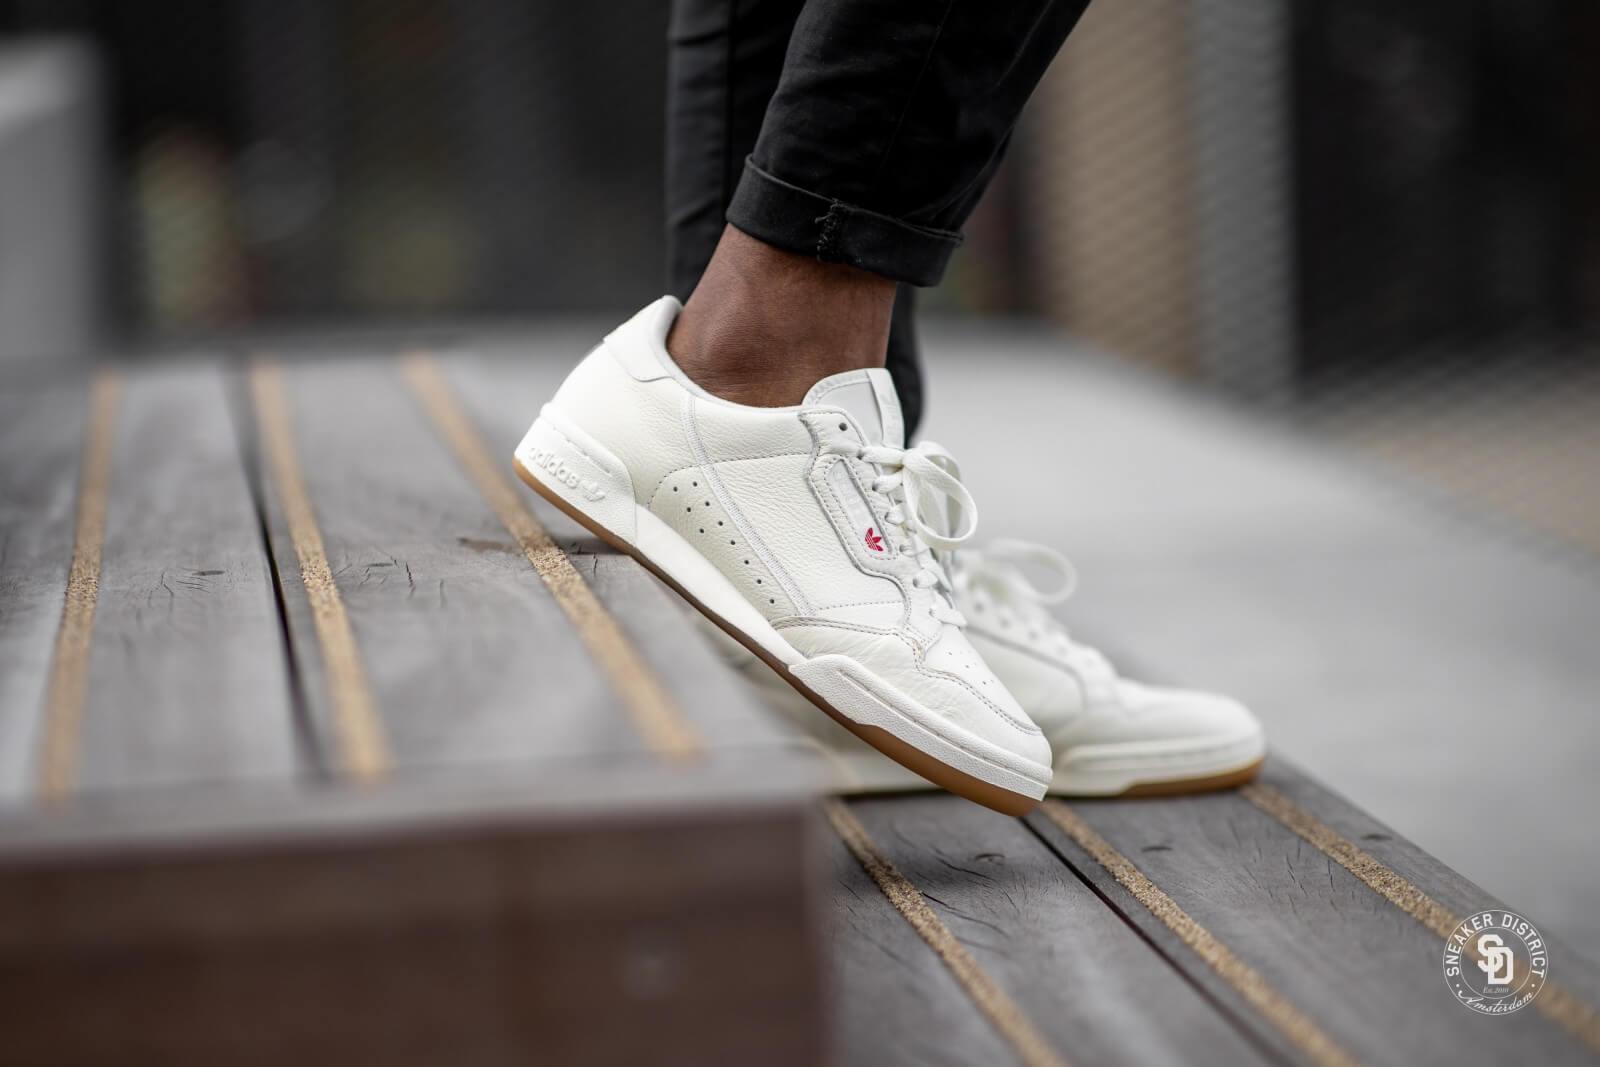 Adidas Continental 80 Off White/Raw